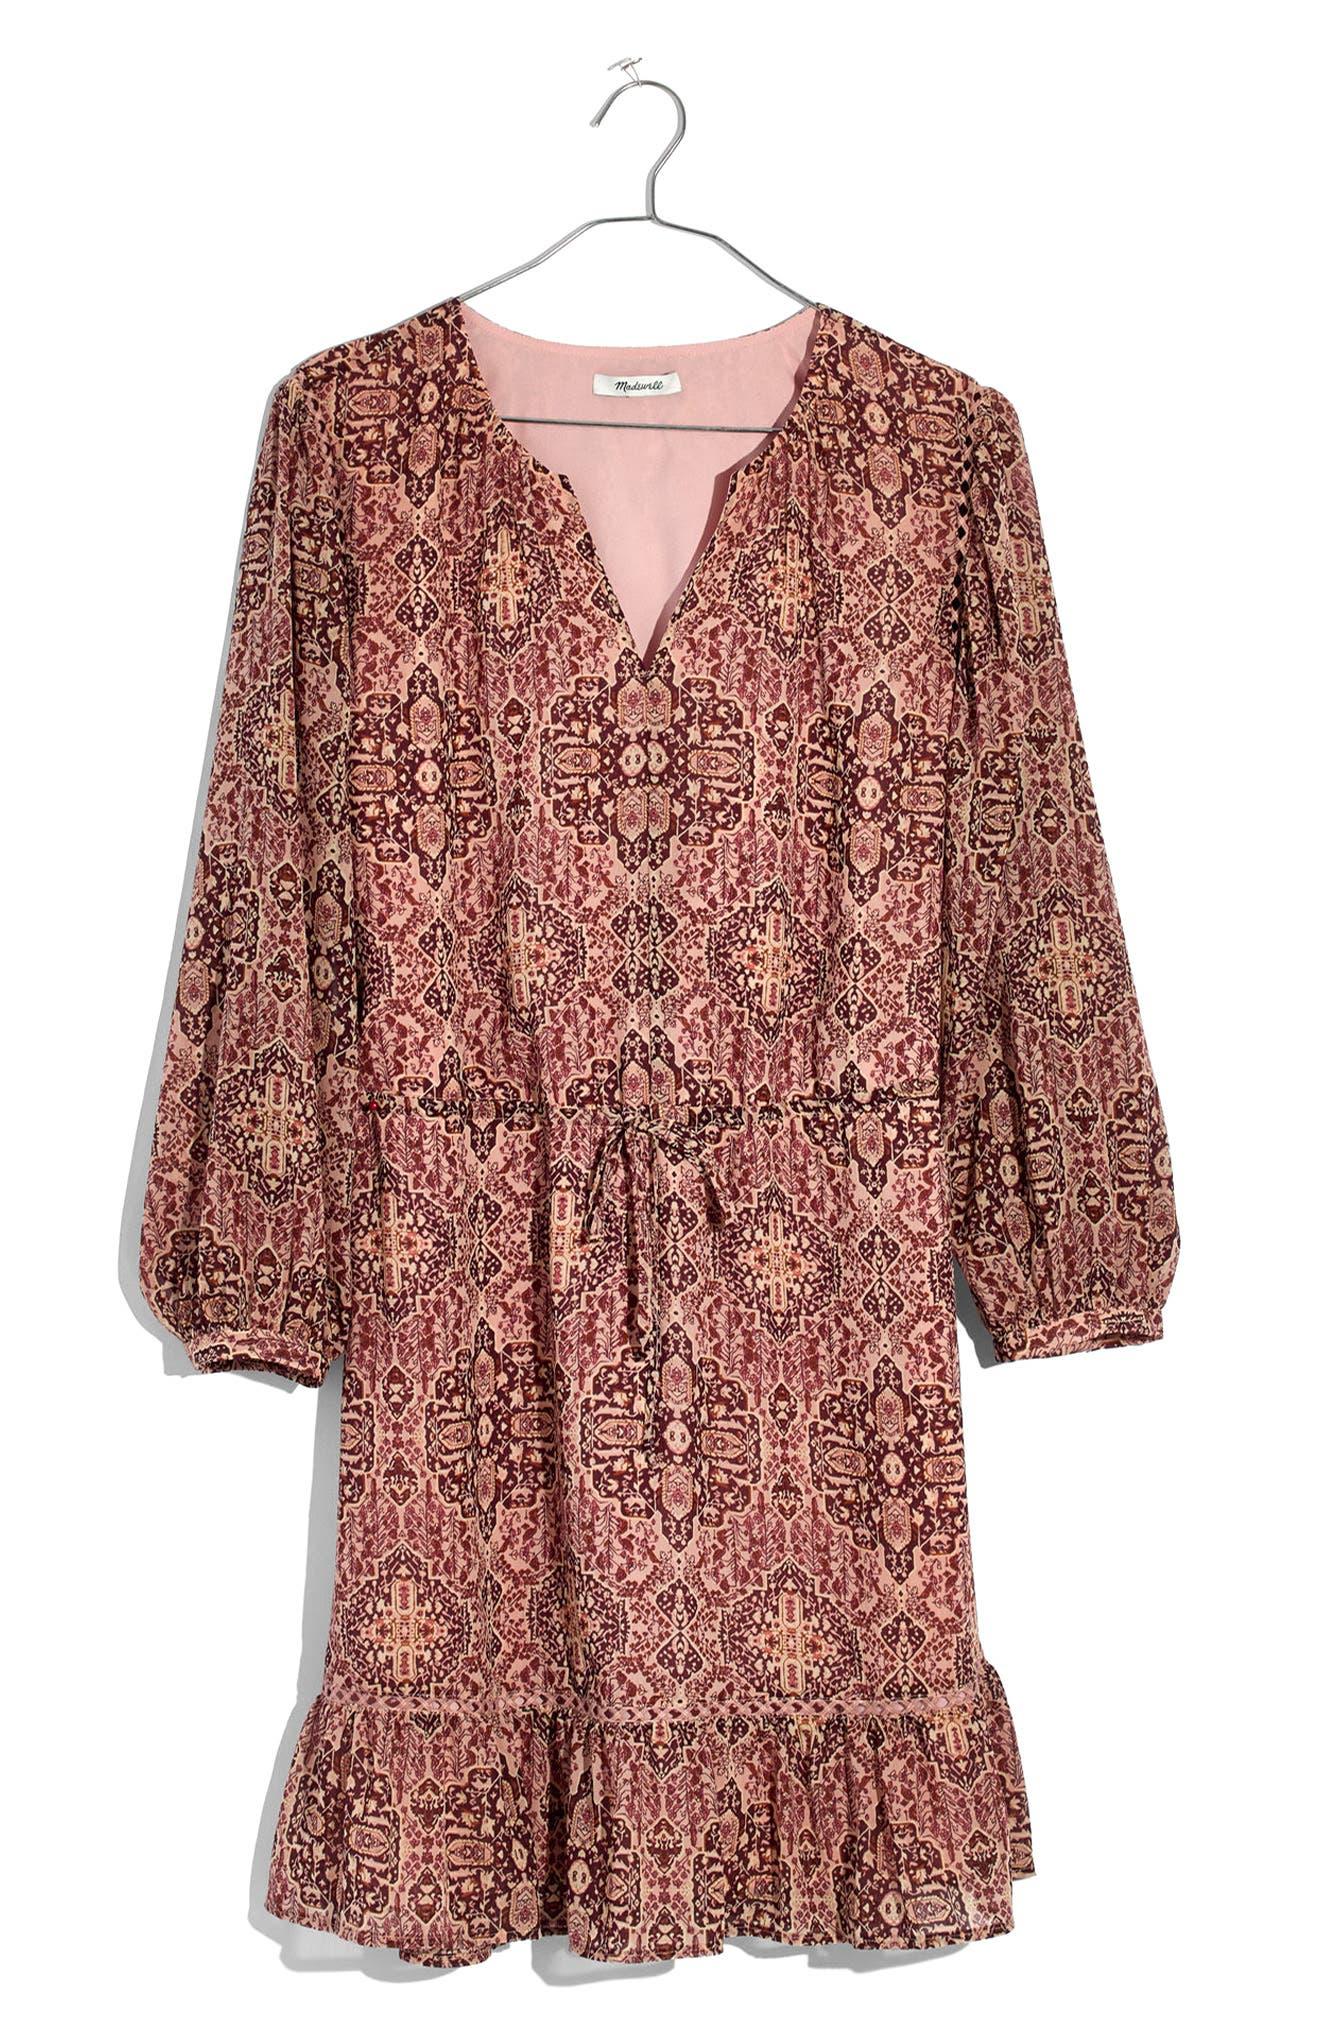 Drawstring Peasant Dress,                             Alternate thumbnail 3, color,                             Gentle Blush